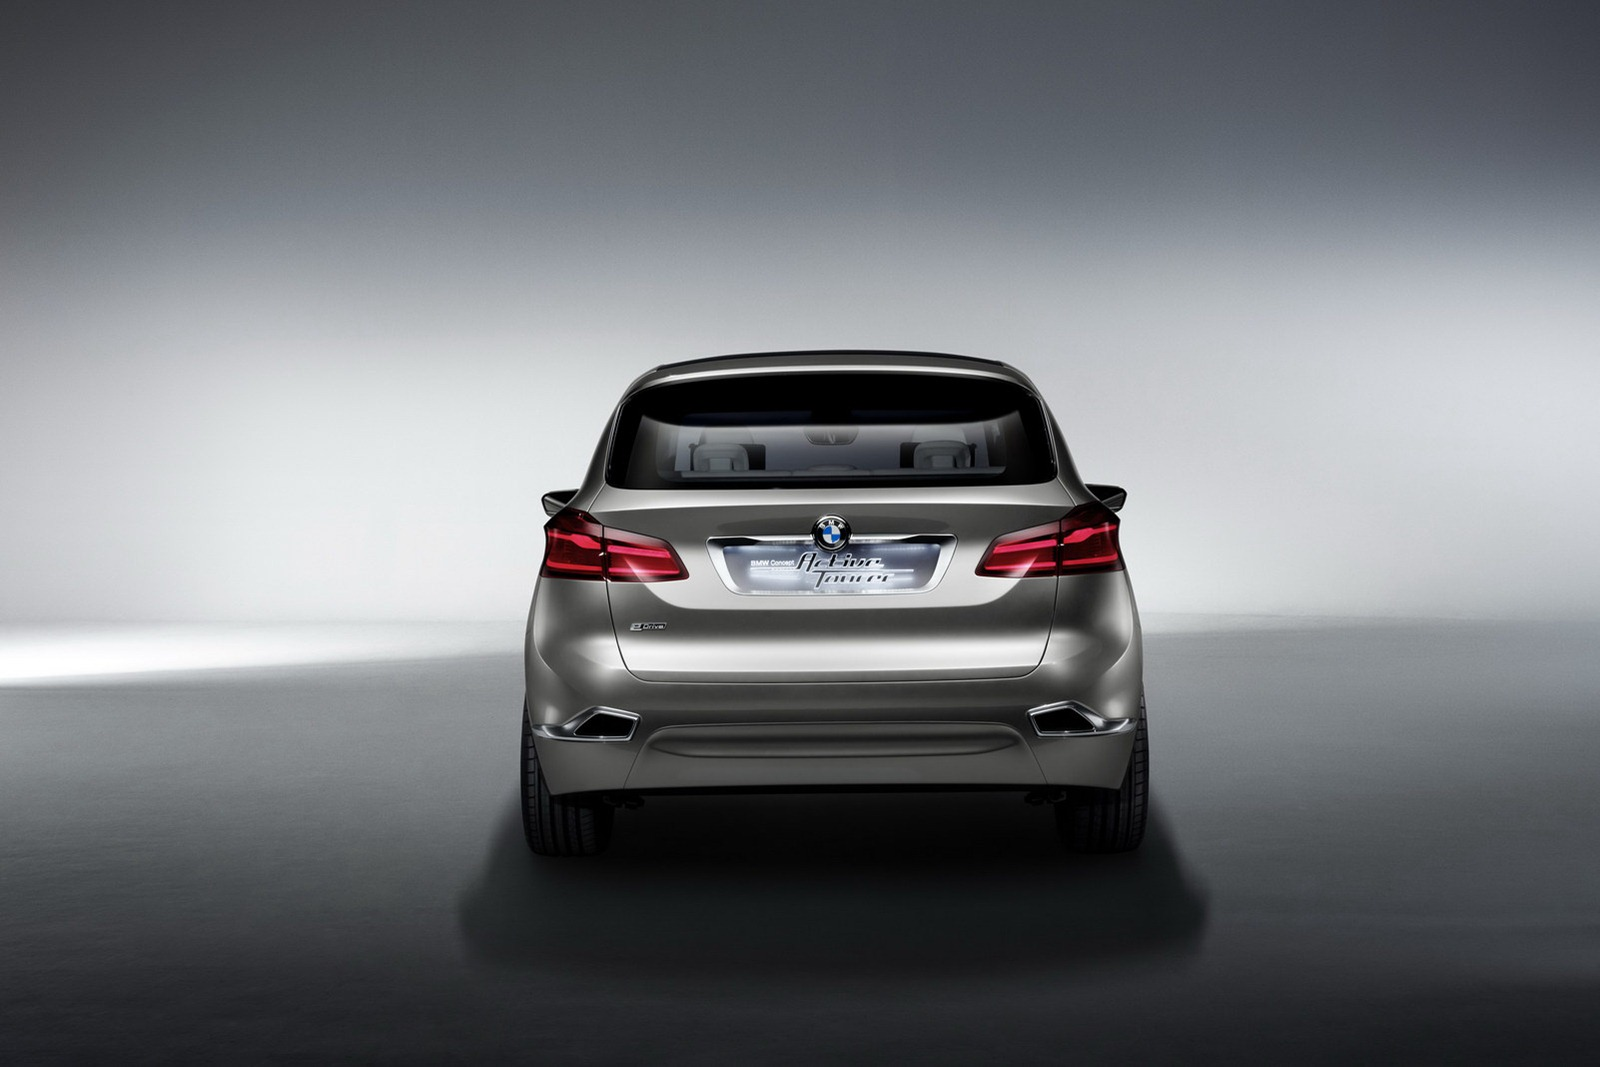 2012 BMW Active Tourer Concept Revealed: Previews 1er GT - autoevolution